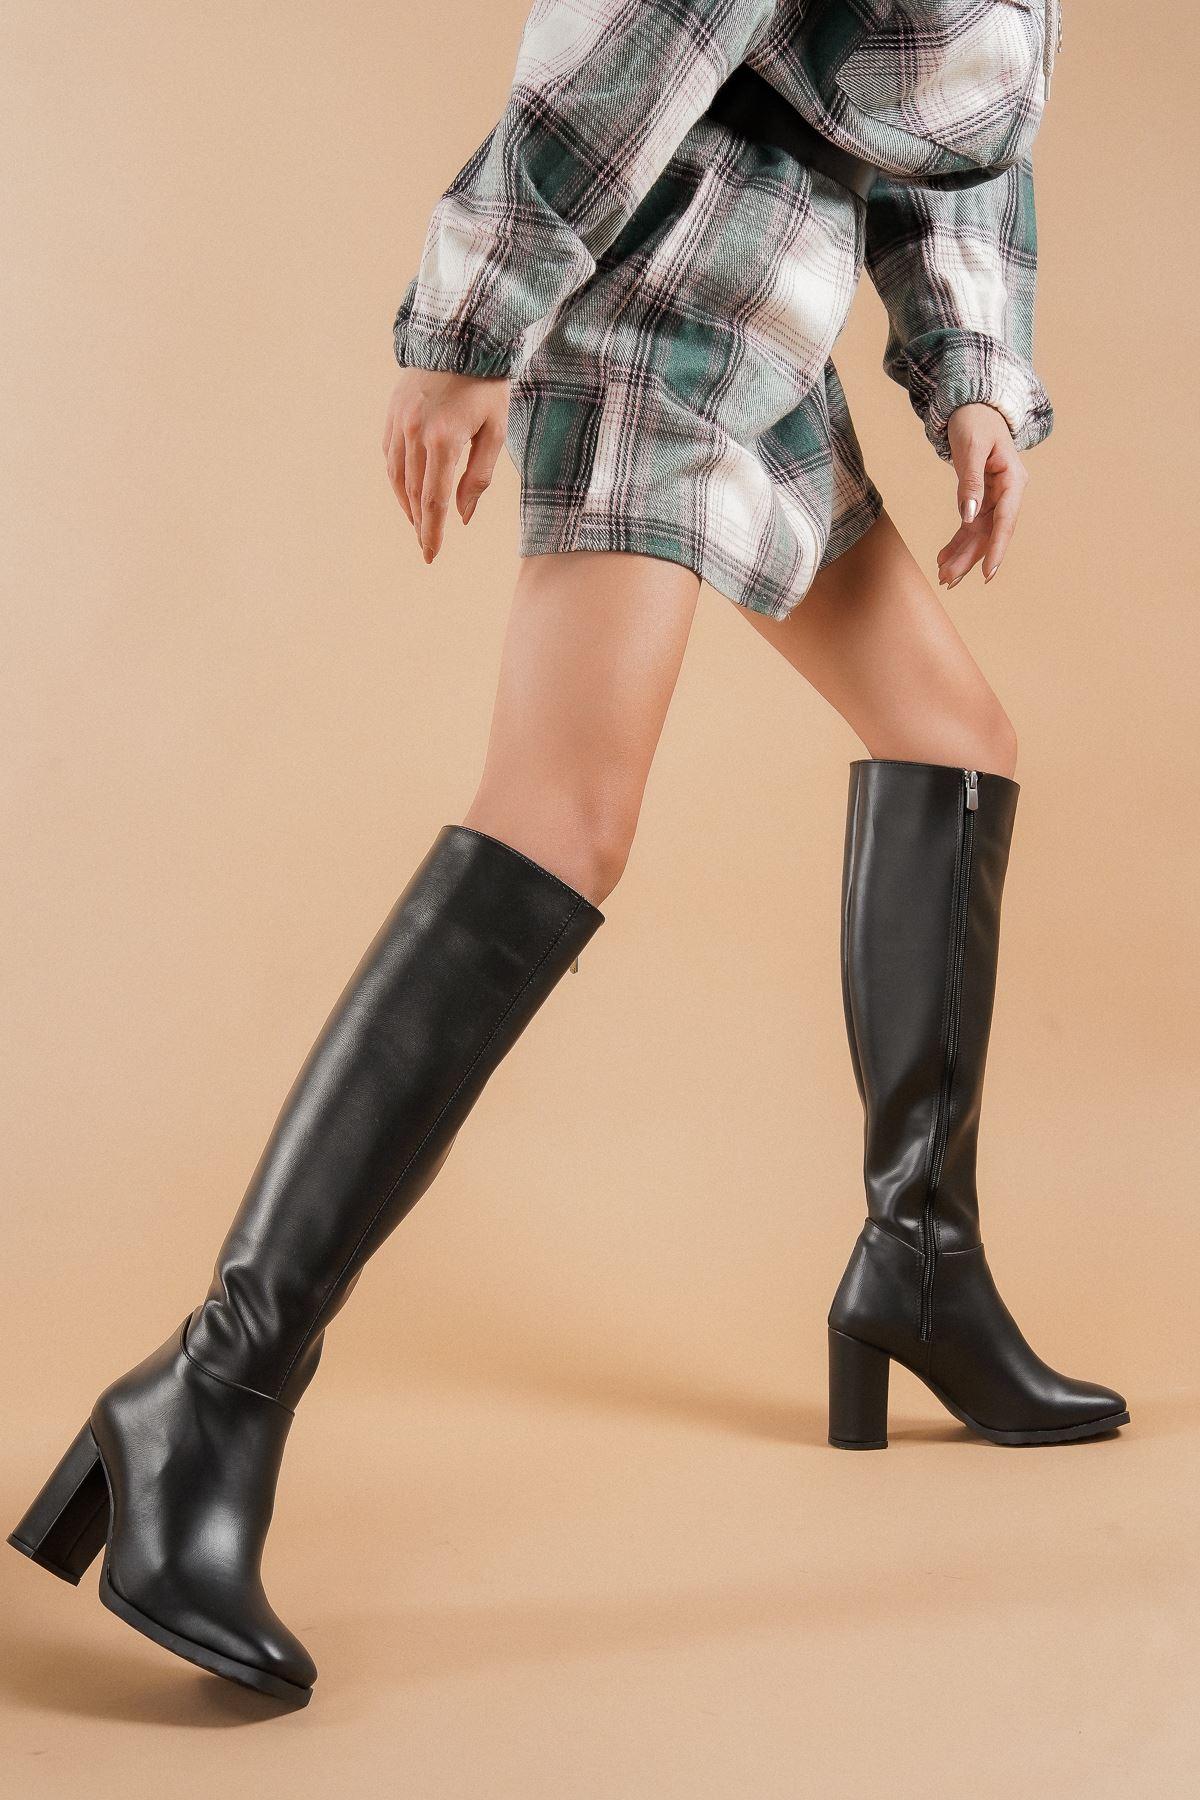 Monet Siyah Cilt Topuklu Kadın Bot